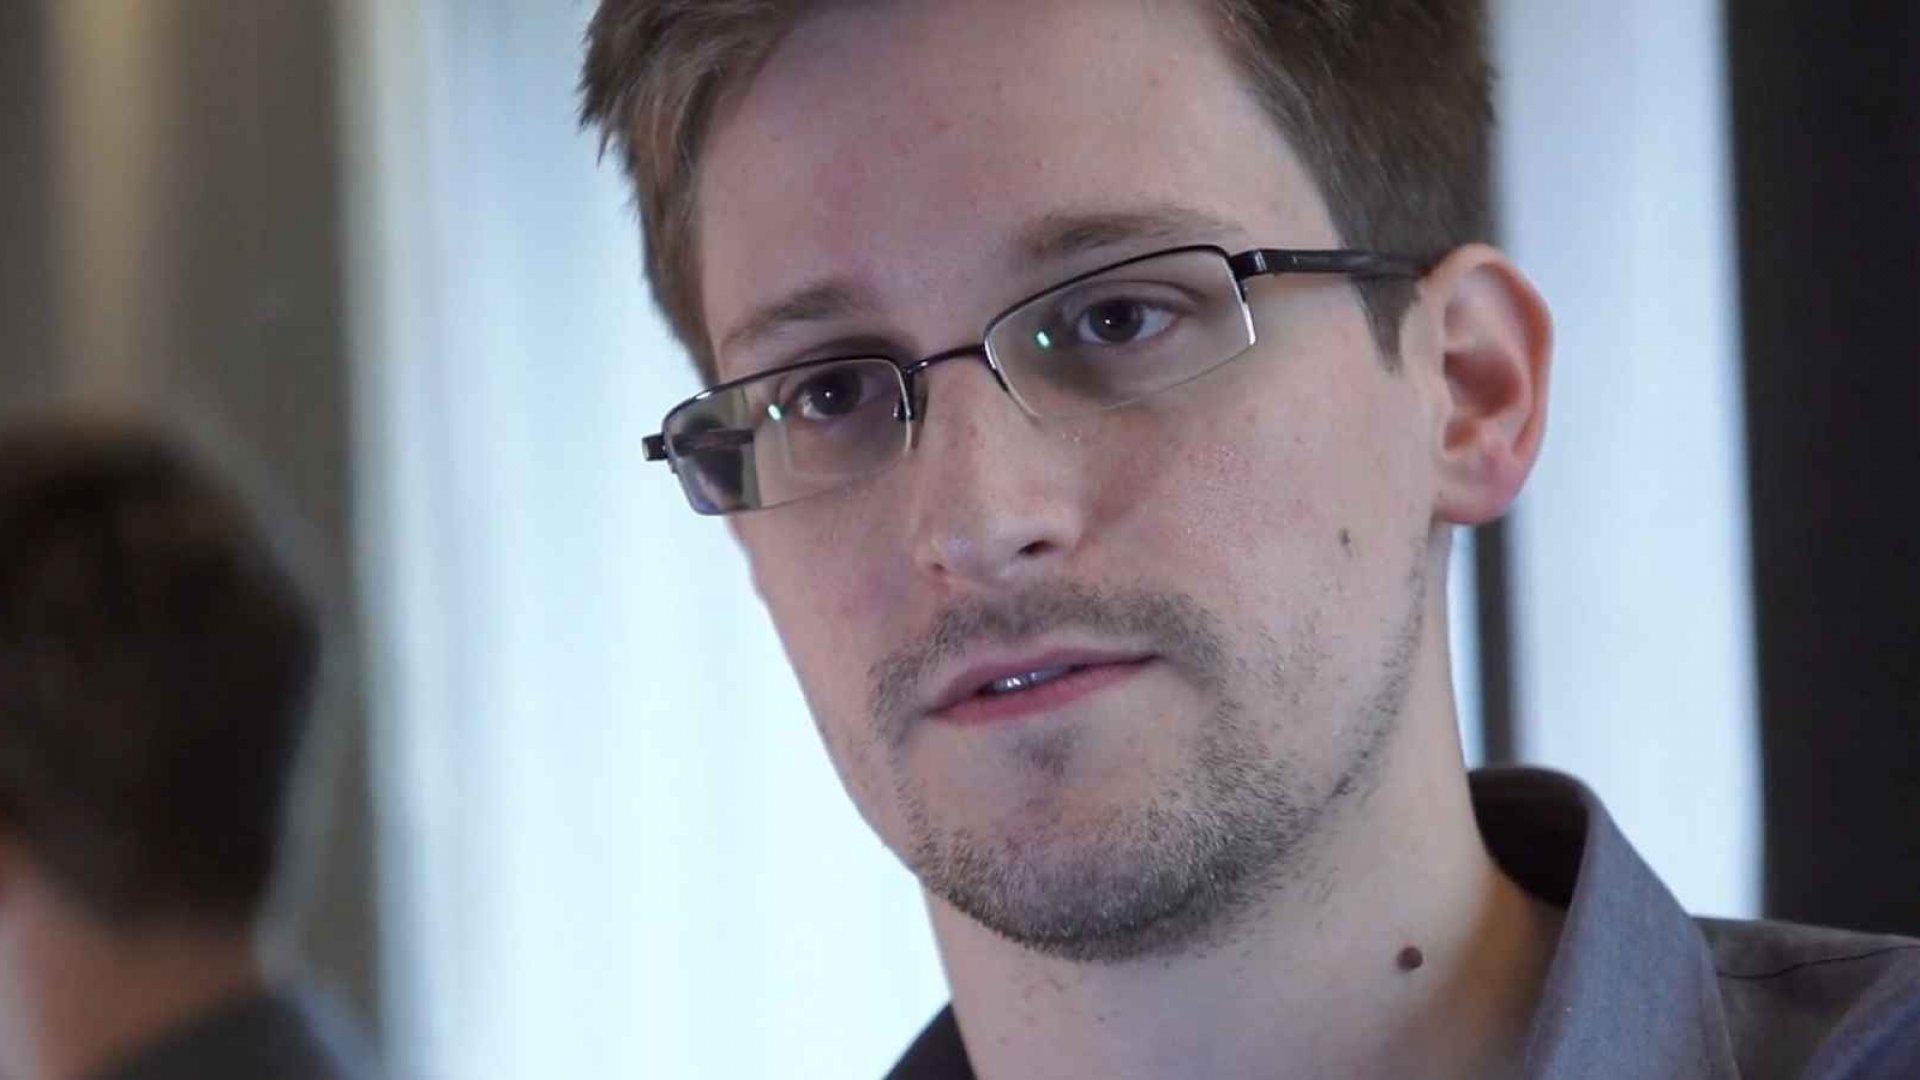 Edward Snowden has already won the encryption war.